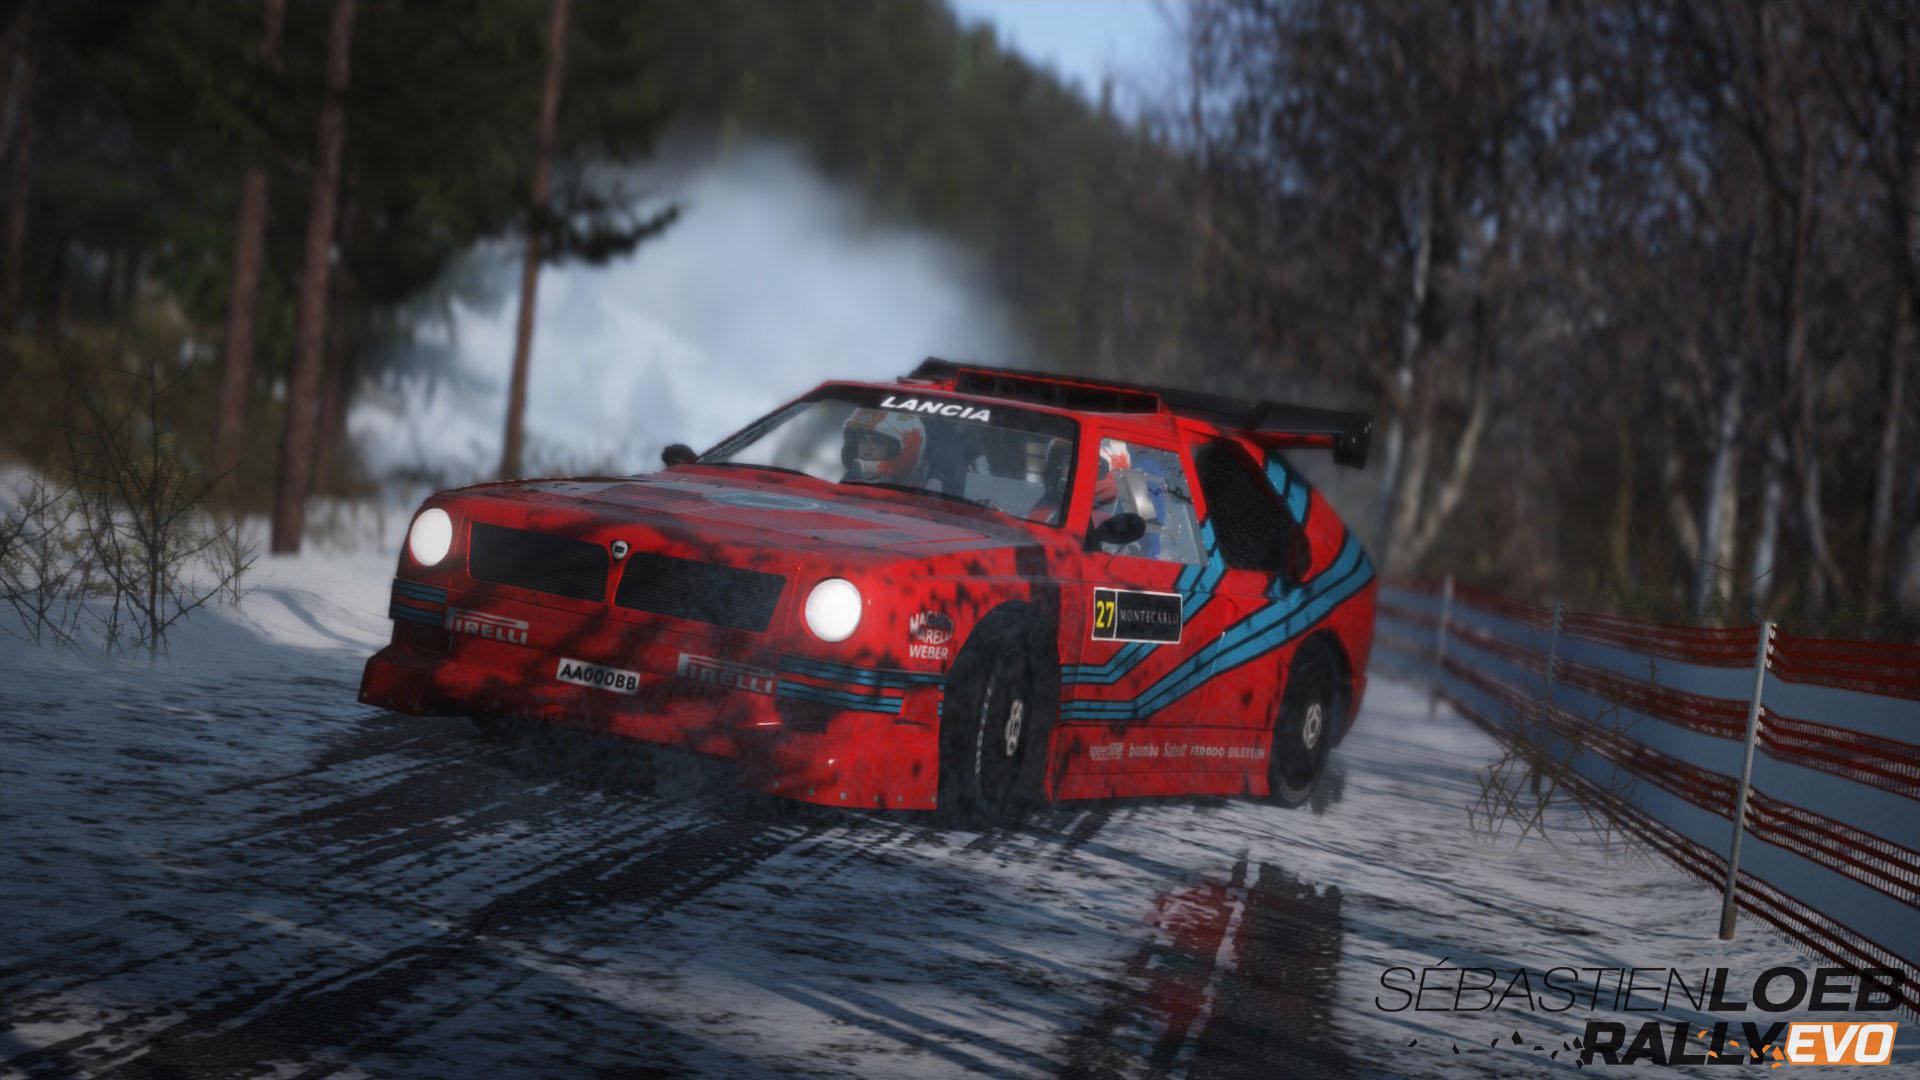 Sébastien Loeb Rally EVO - Class S The Prototypes screenshot